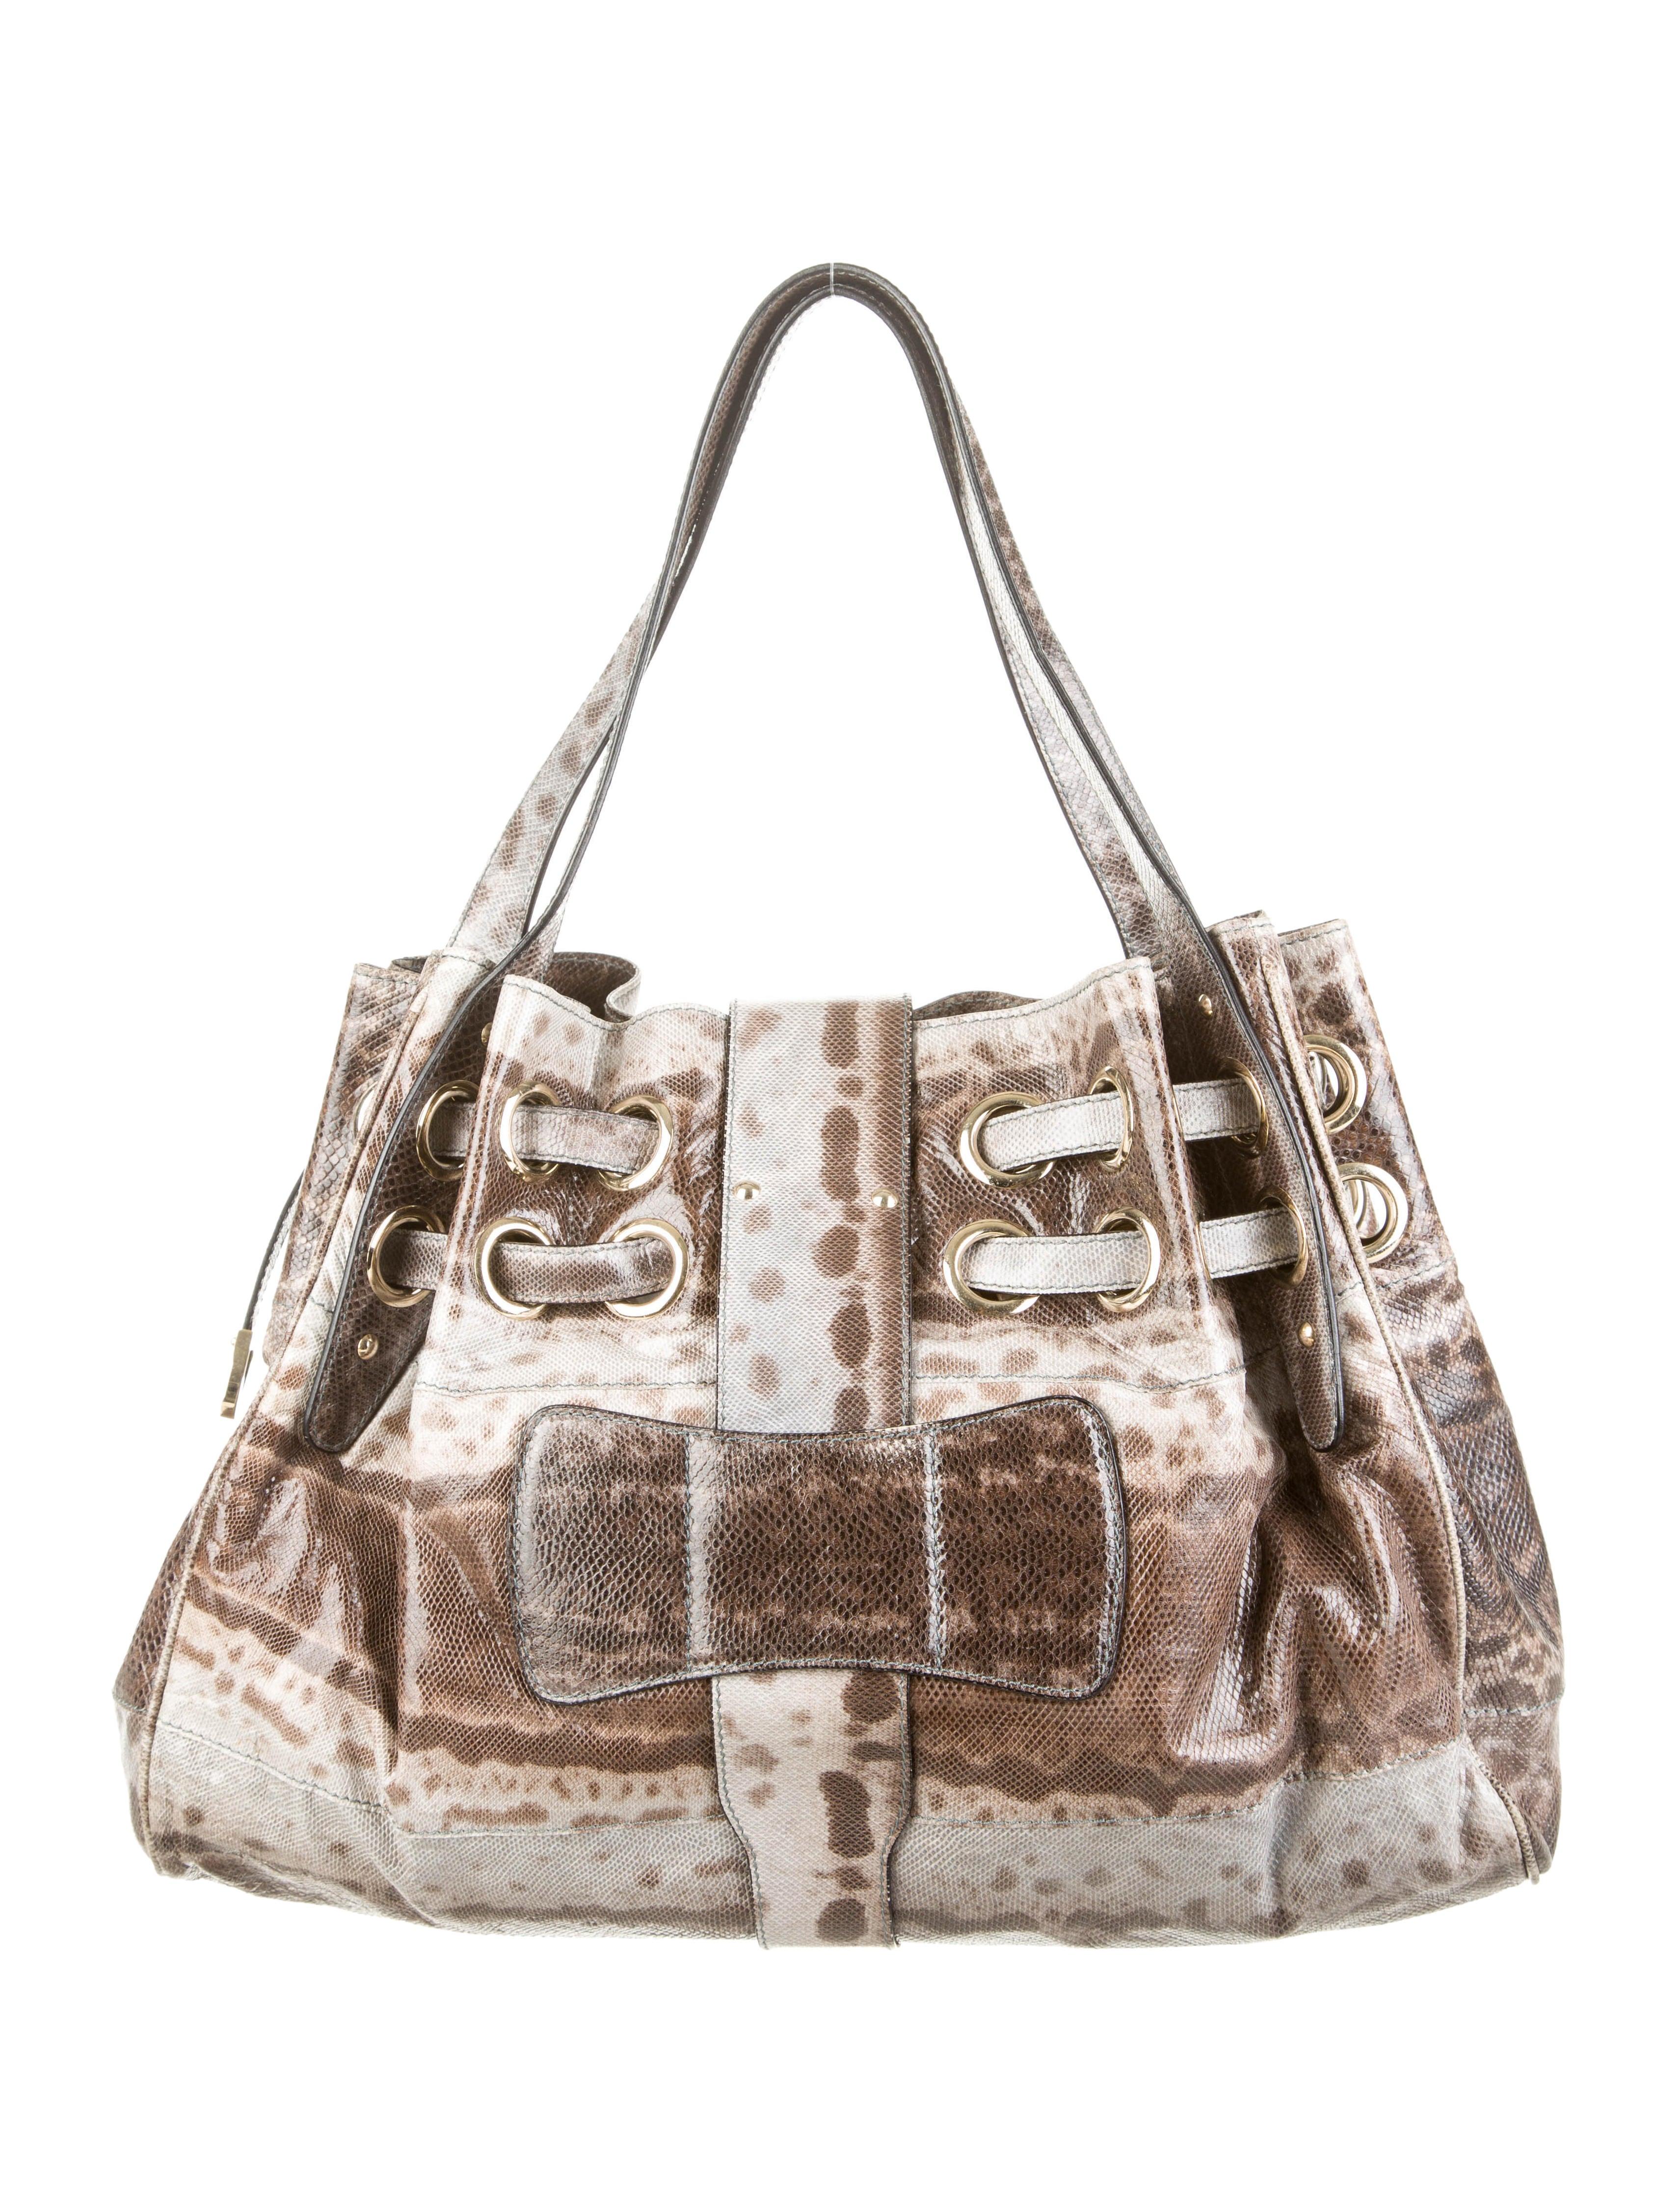 Jimmy Choo Karung Riki Bag - Handbags - JIM42191 | The RealReal